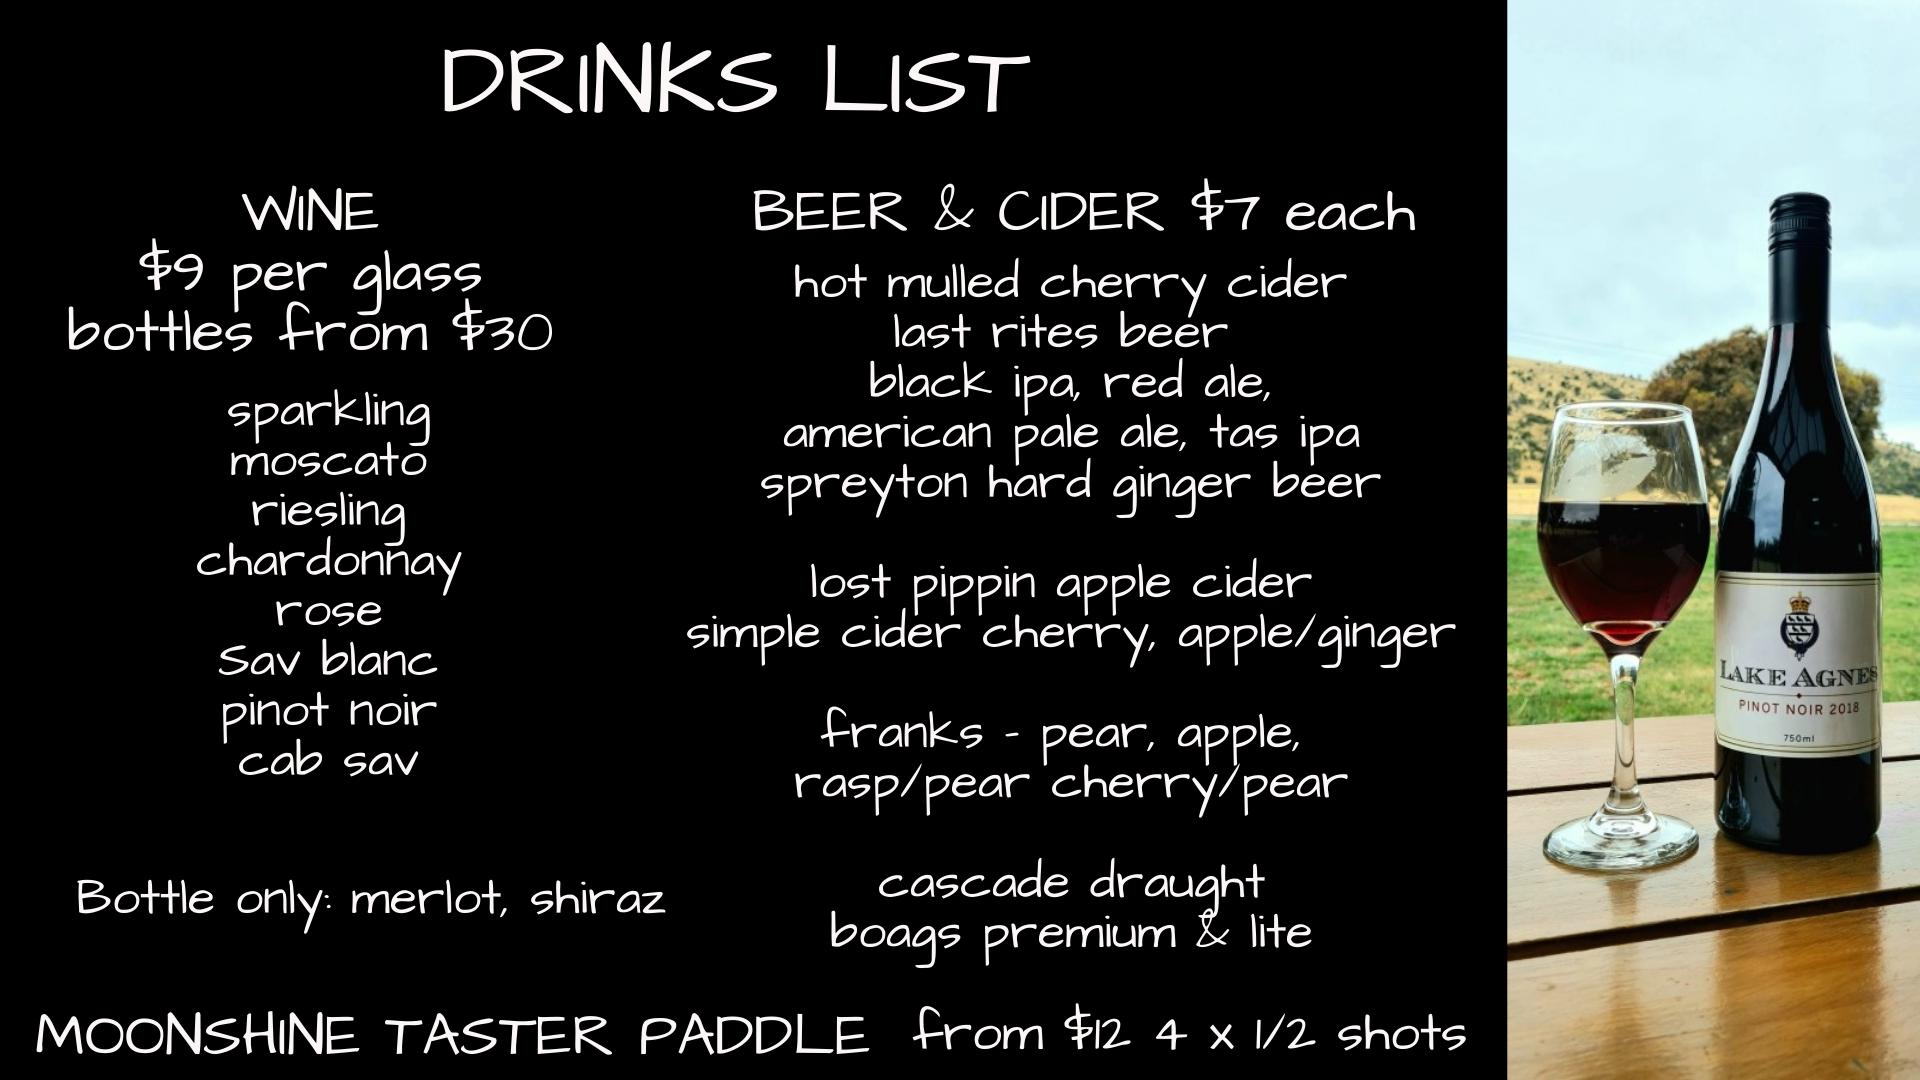 drinks-alc-menu-01.09.21.png